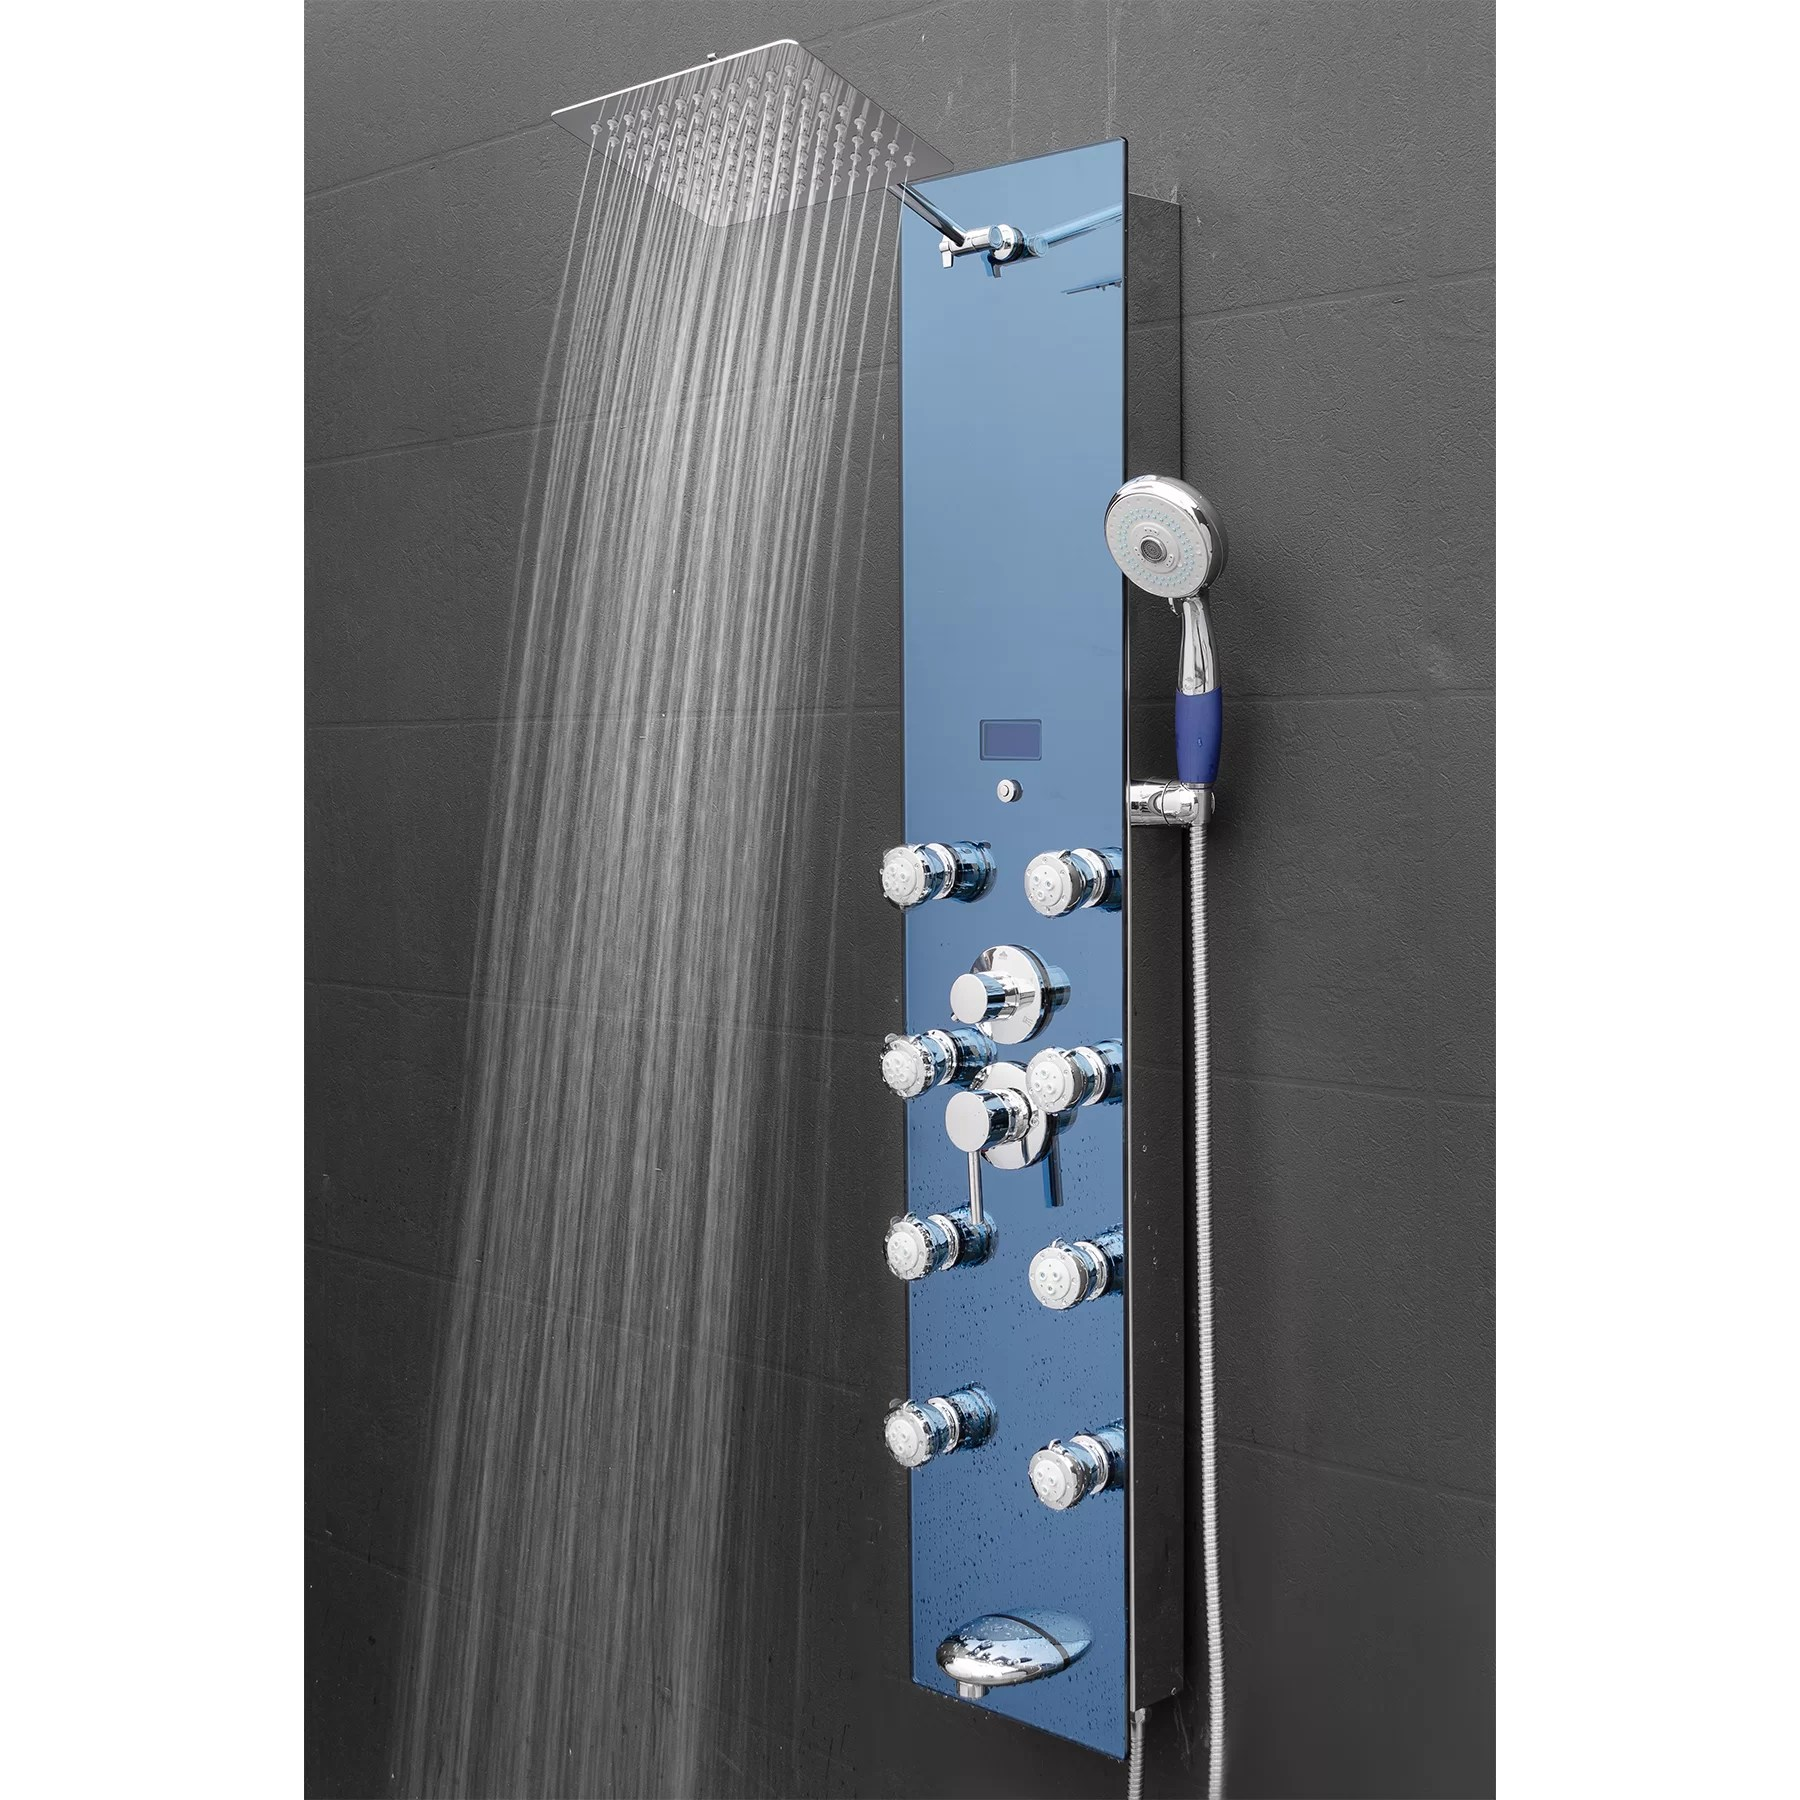 AKDY Tower Rainfall Shower Panel System Amp Reviews Wayfairca